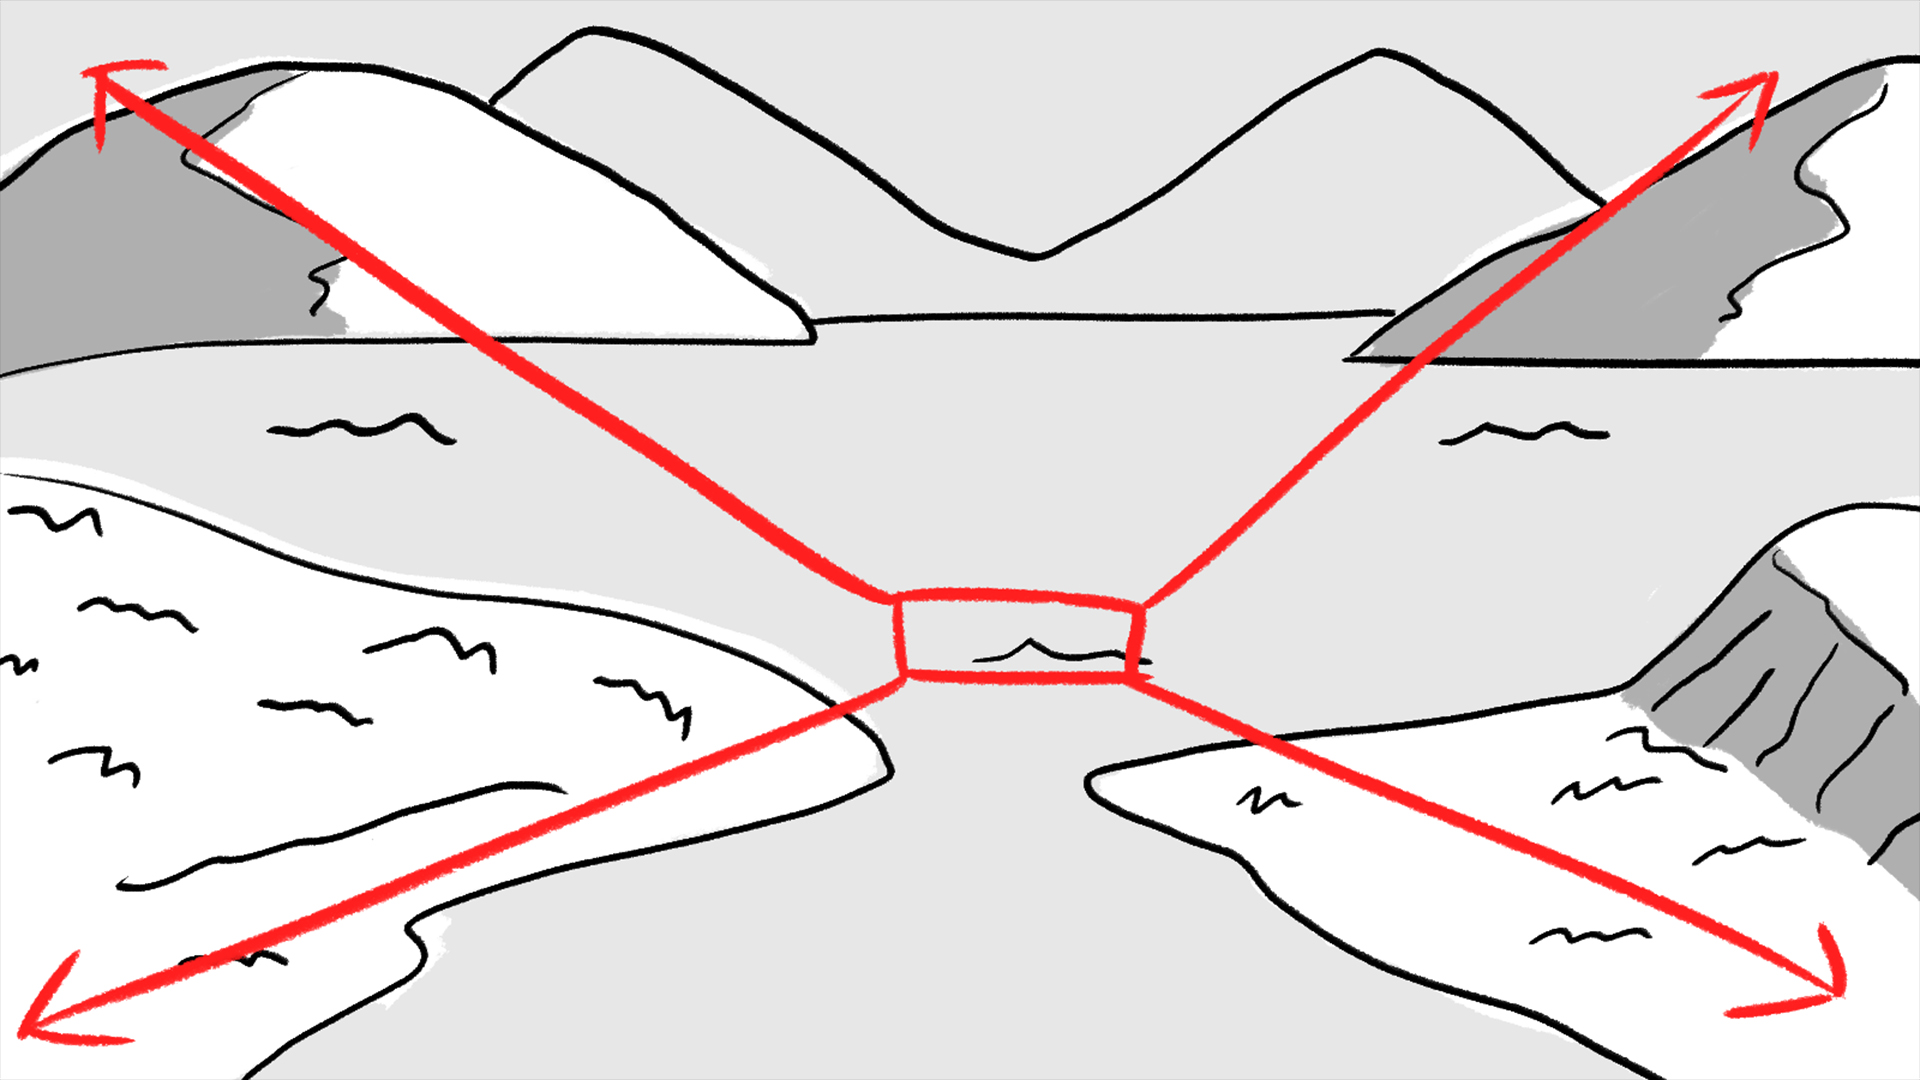 Salmon-2-board-000010017.jpg